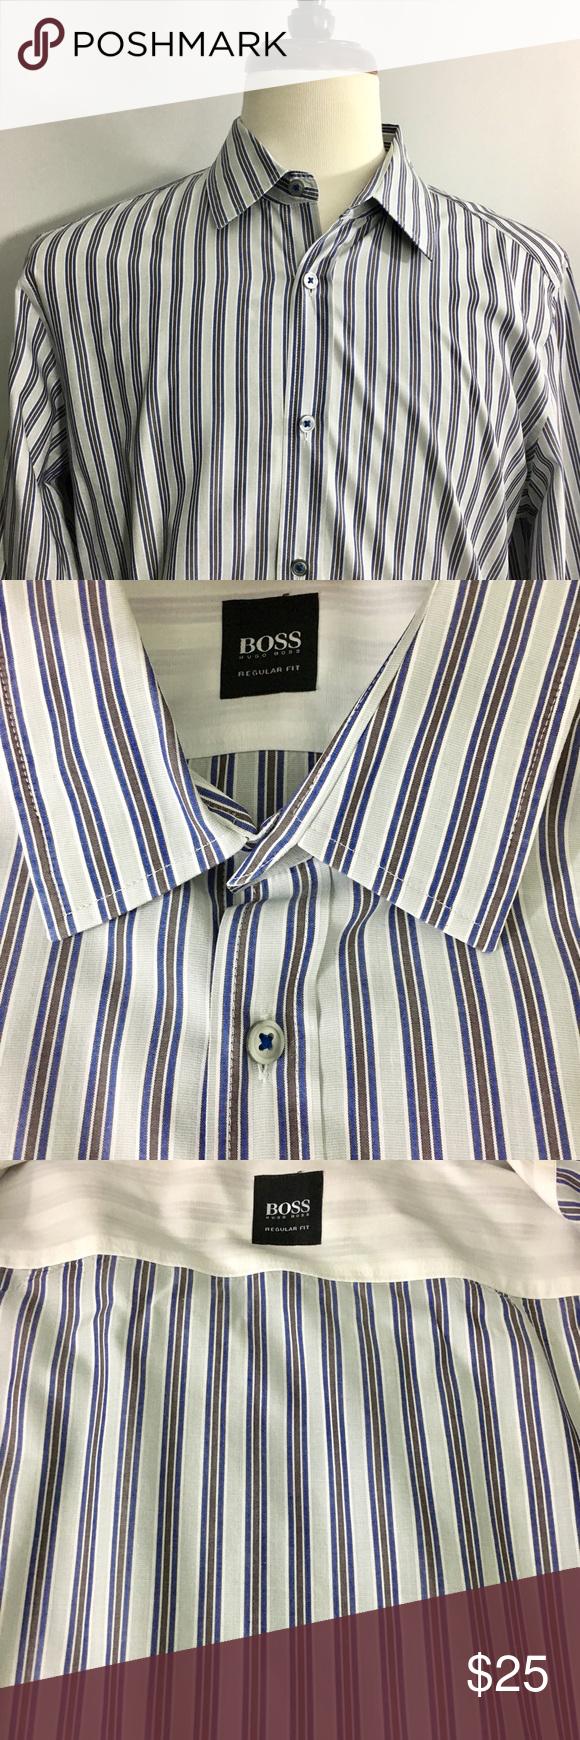 Hugo Boss Mens Dress Shirt Size Large Hugo Boss Men Boss Shirts